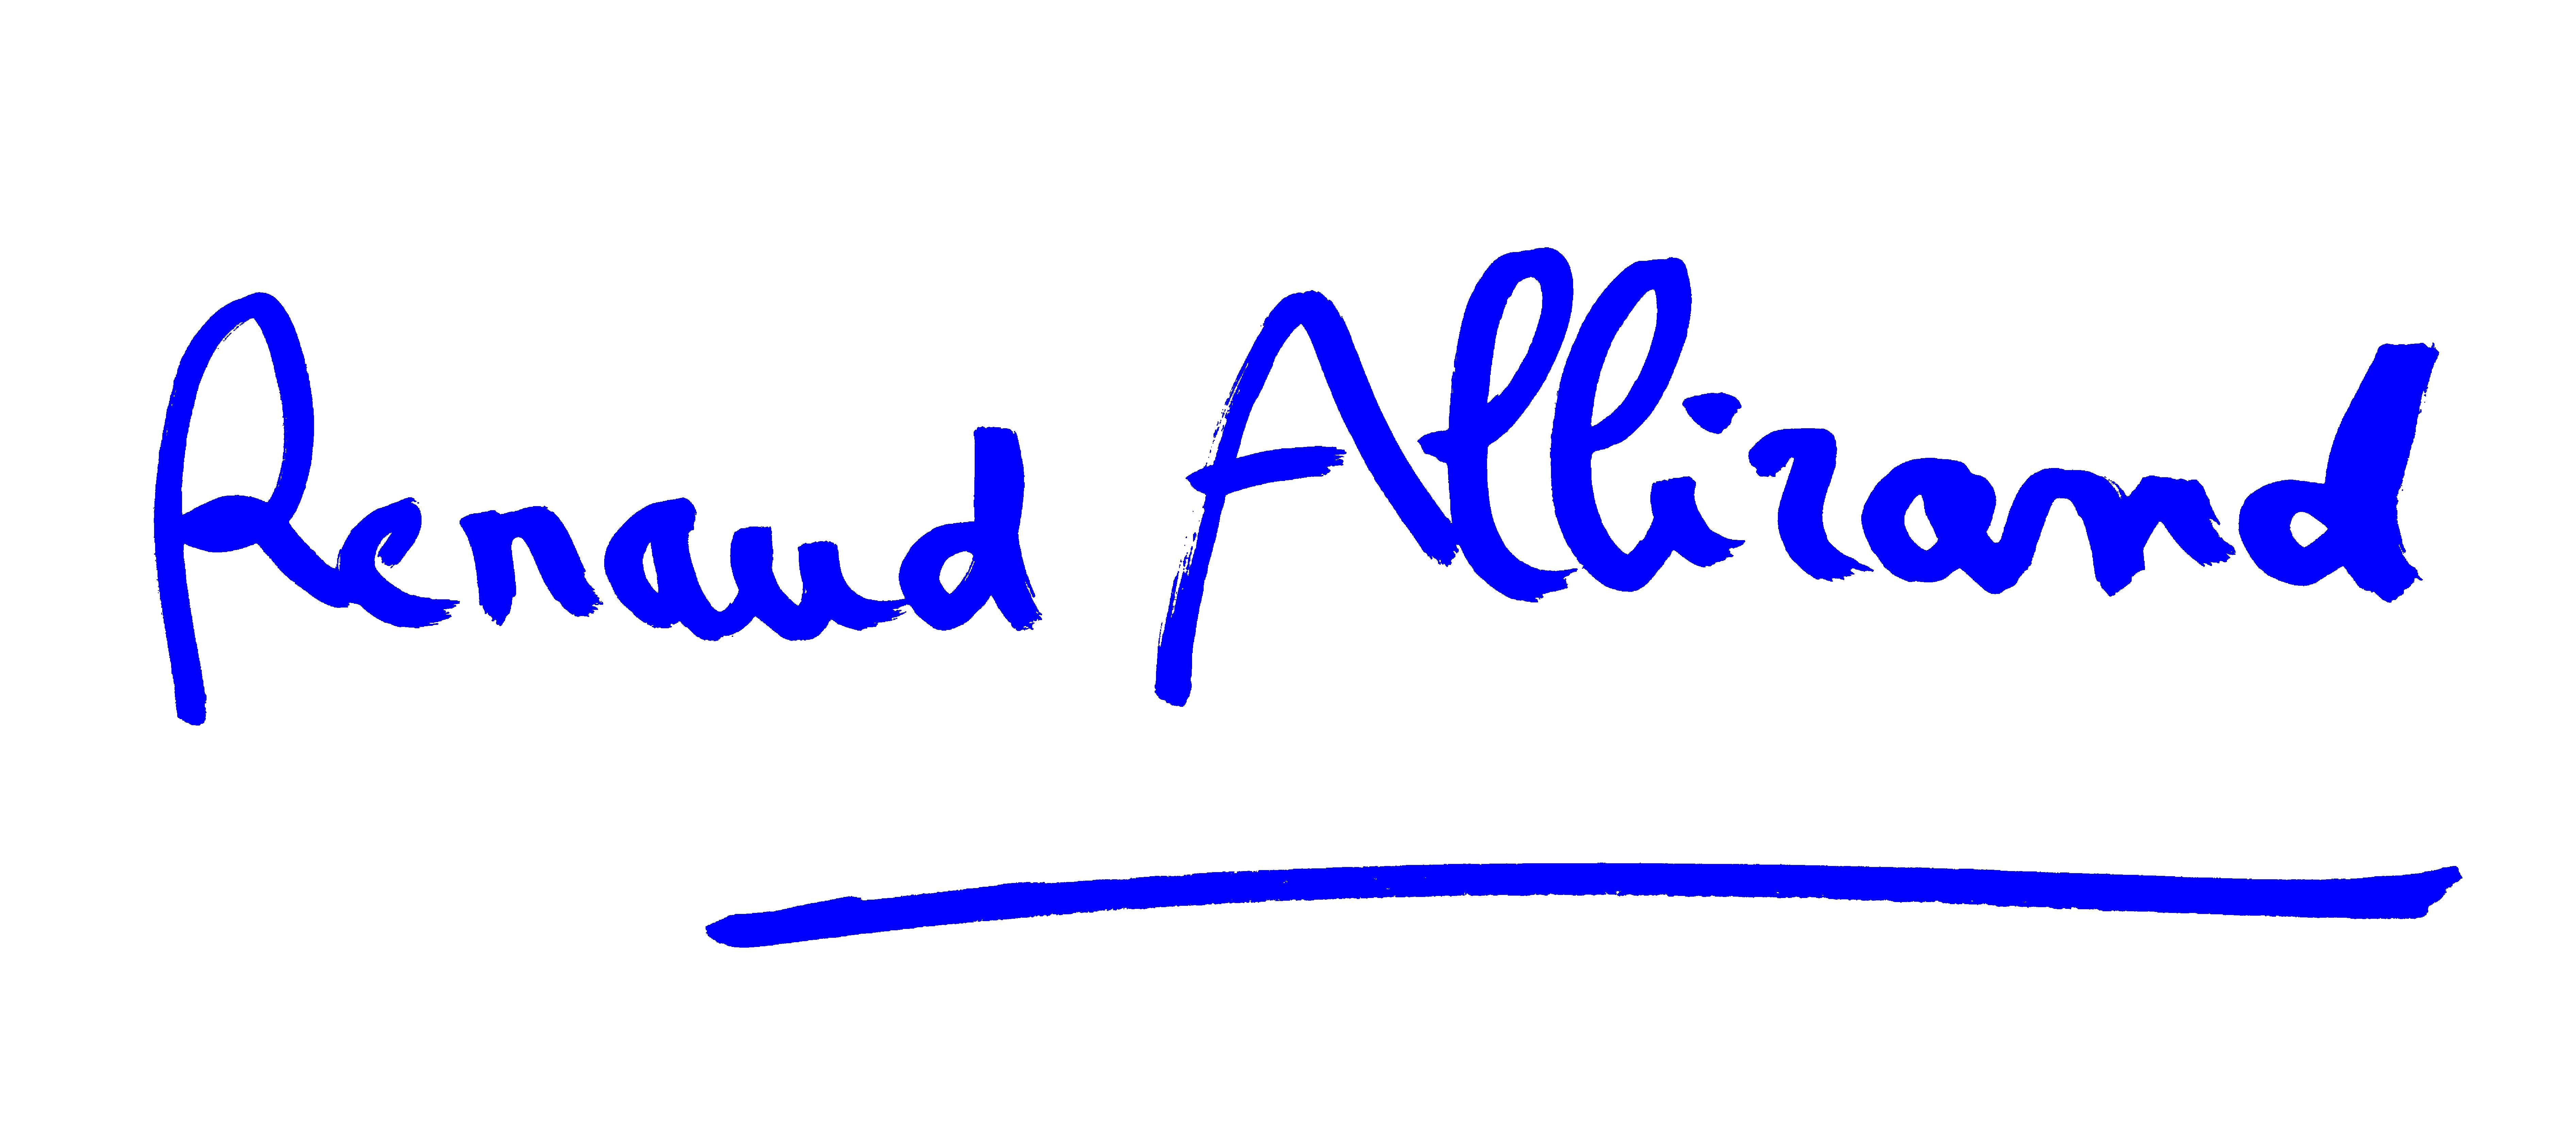 renaud allirand's Signature